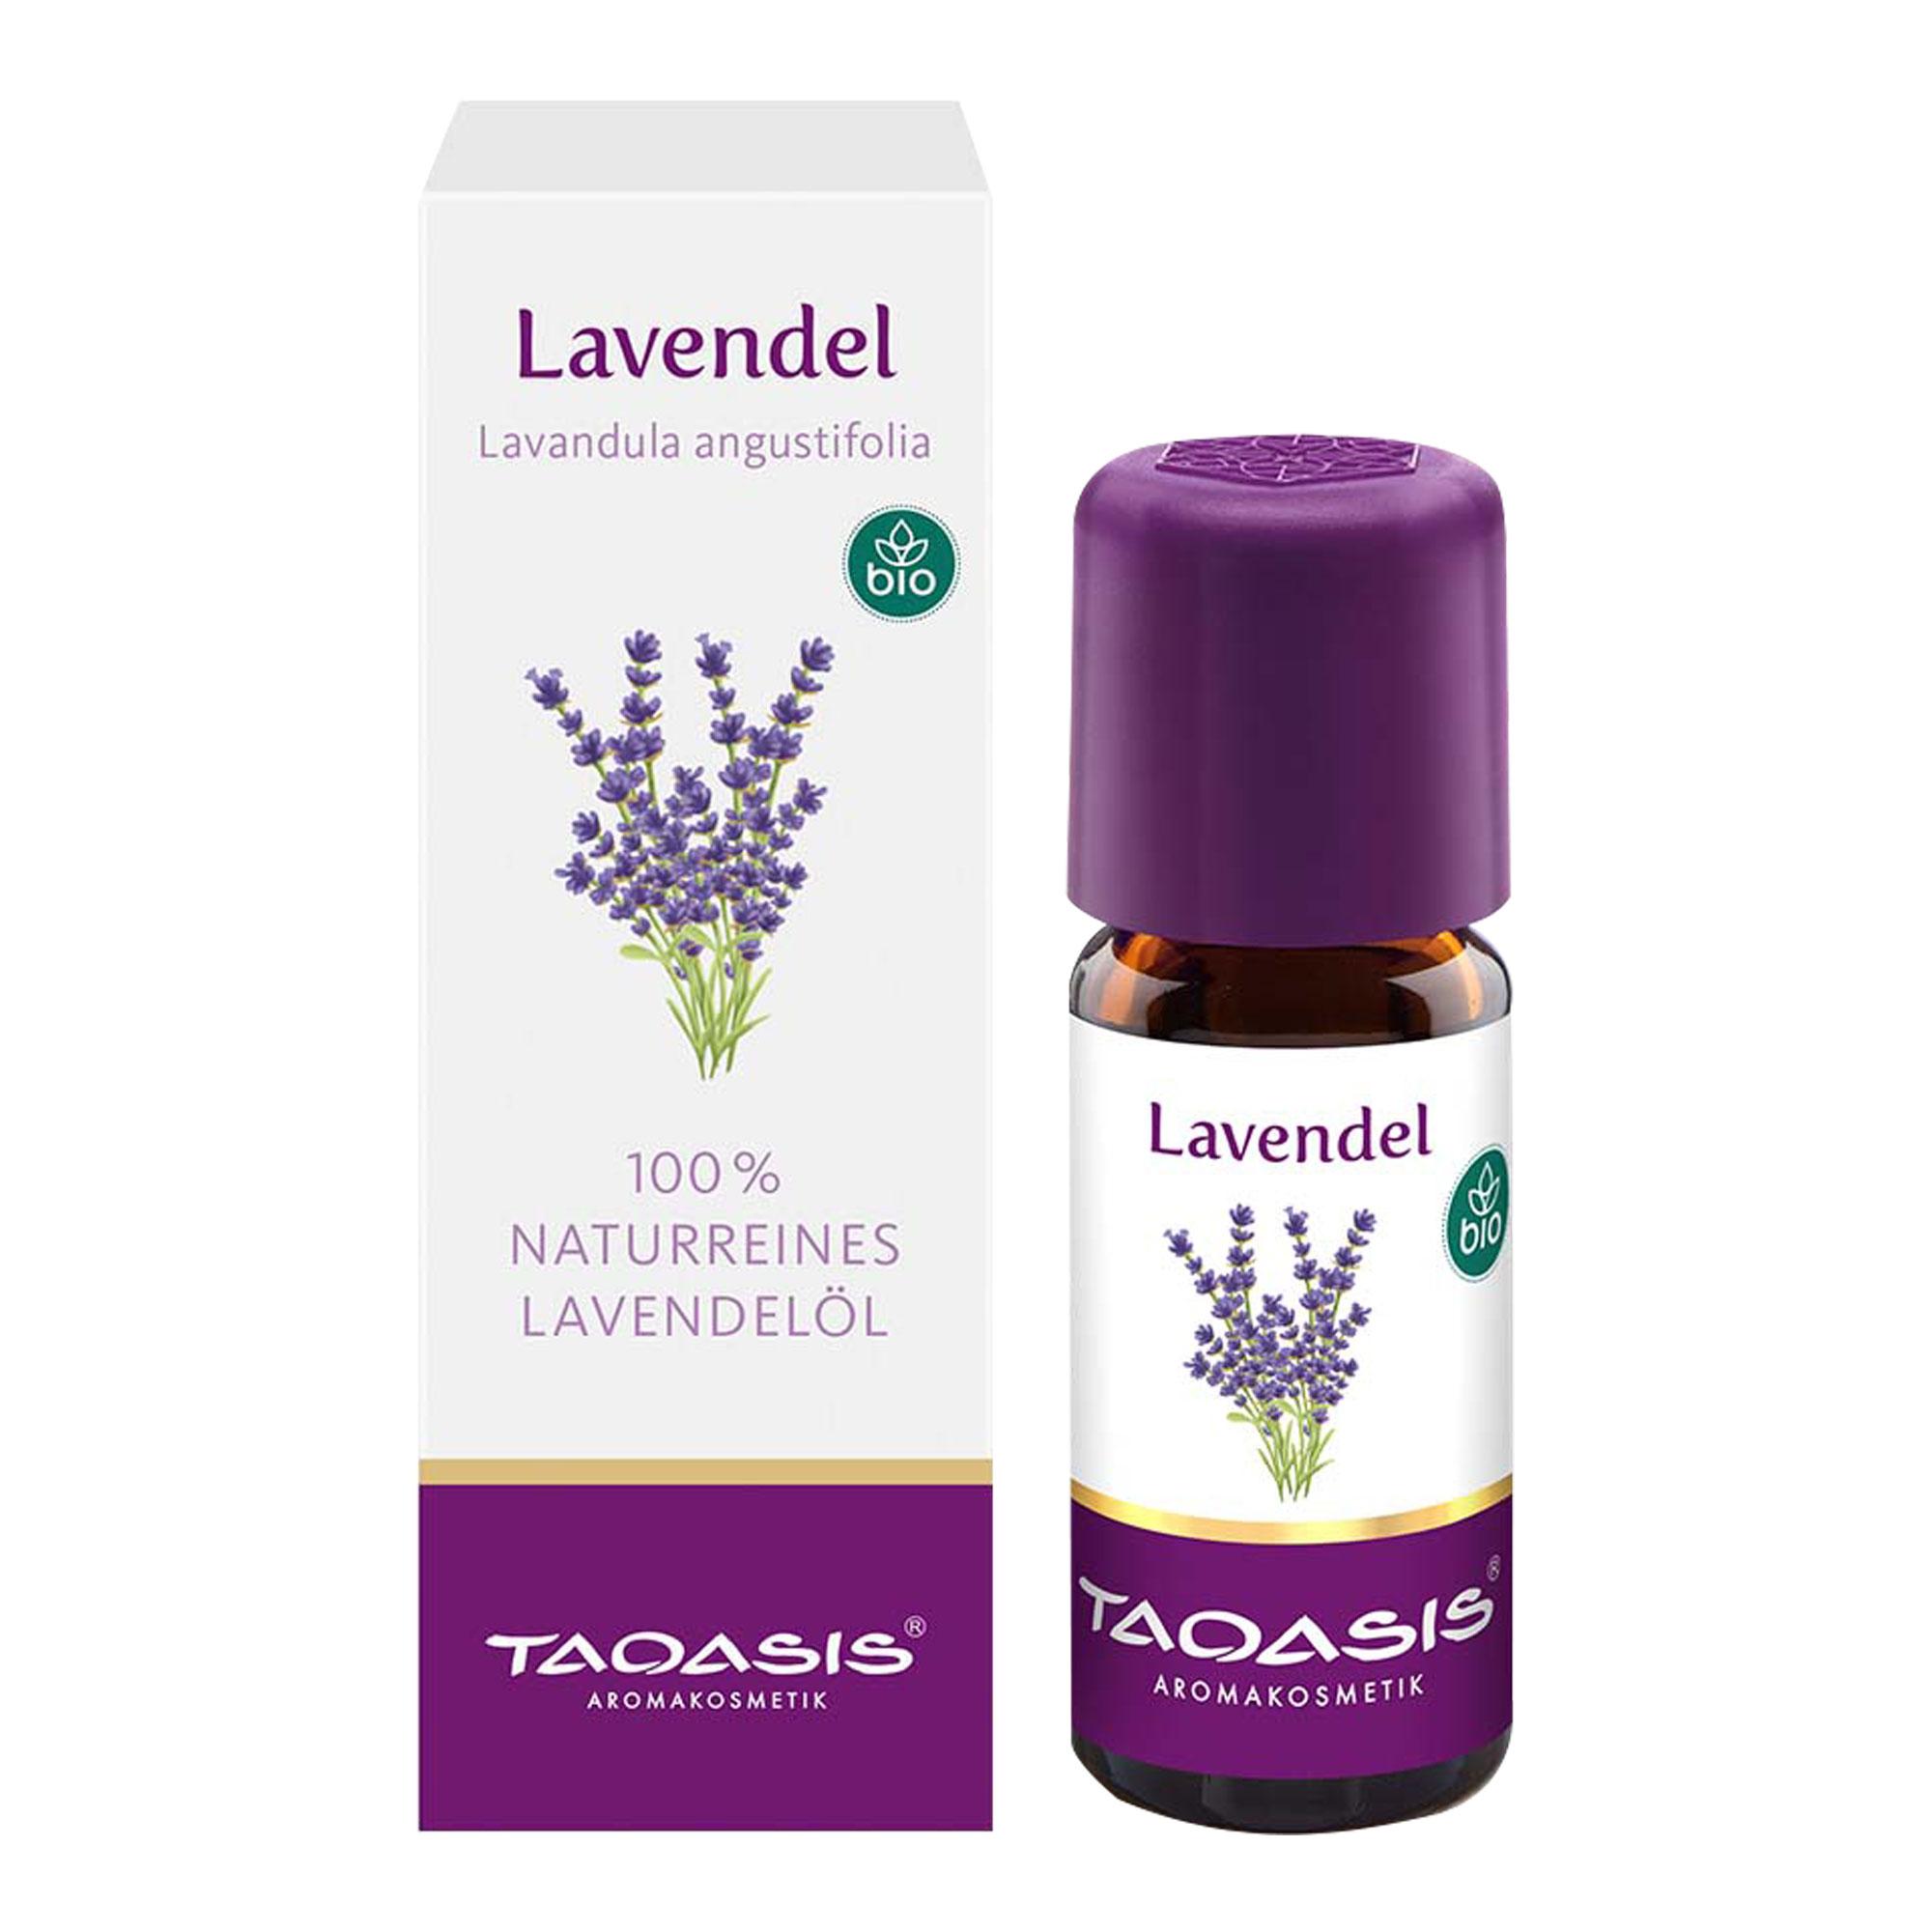 Lavendel ÖL im Umkarton